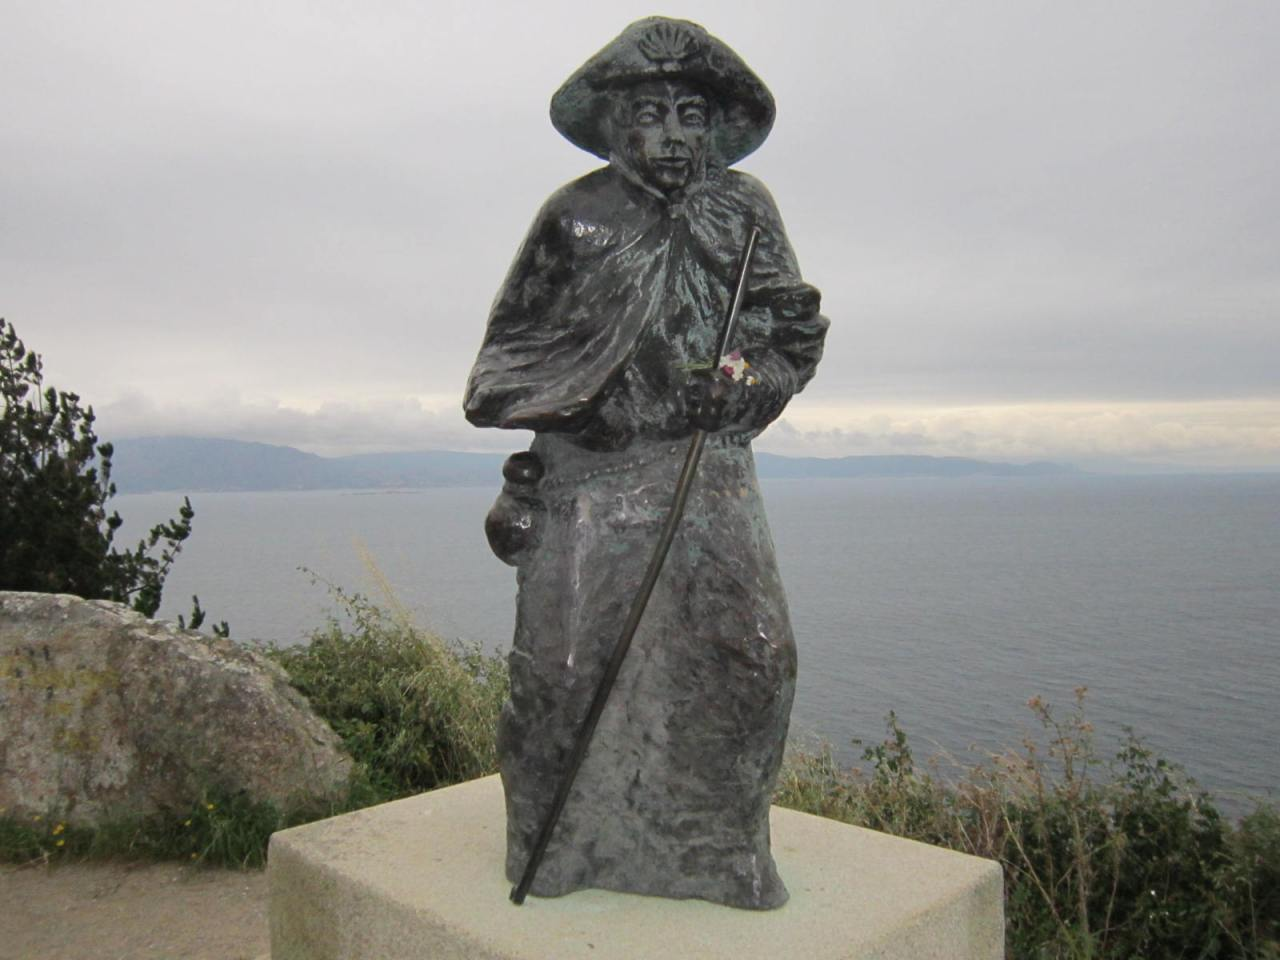 Statue of a wind-blown pilgrim at Cape Finisterre/Fisterra (Camino Finisterre/Fisterra)